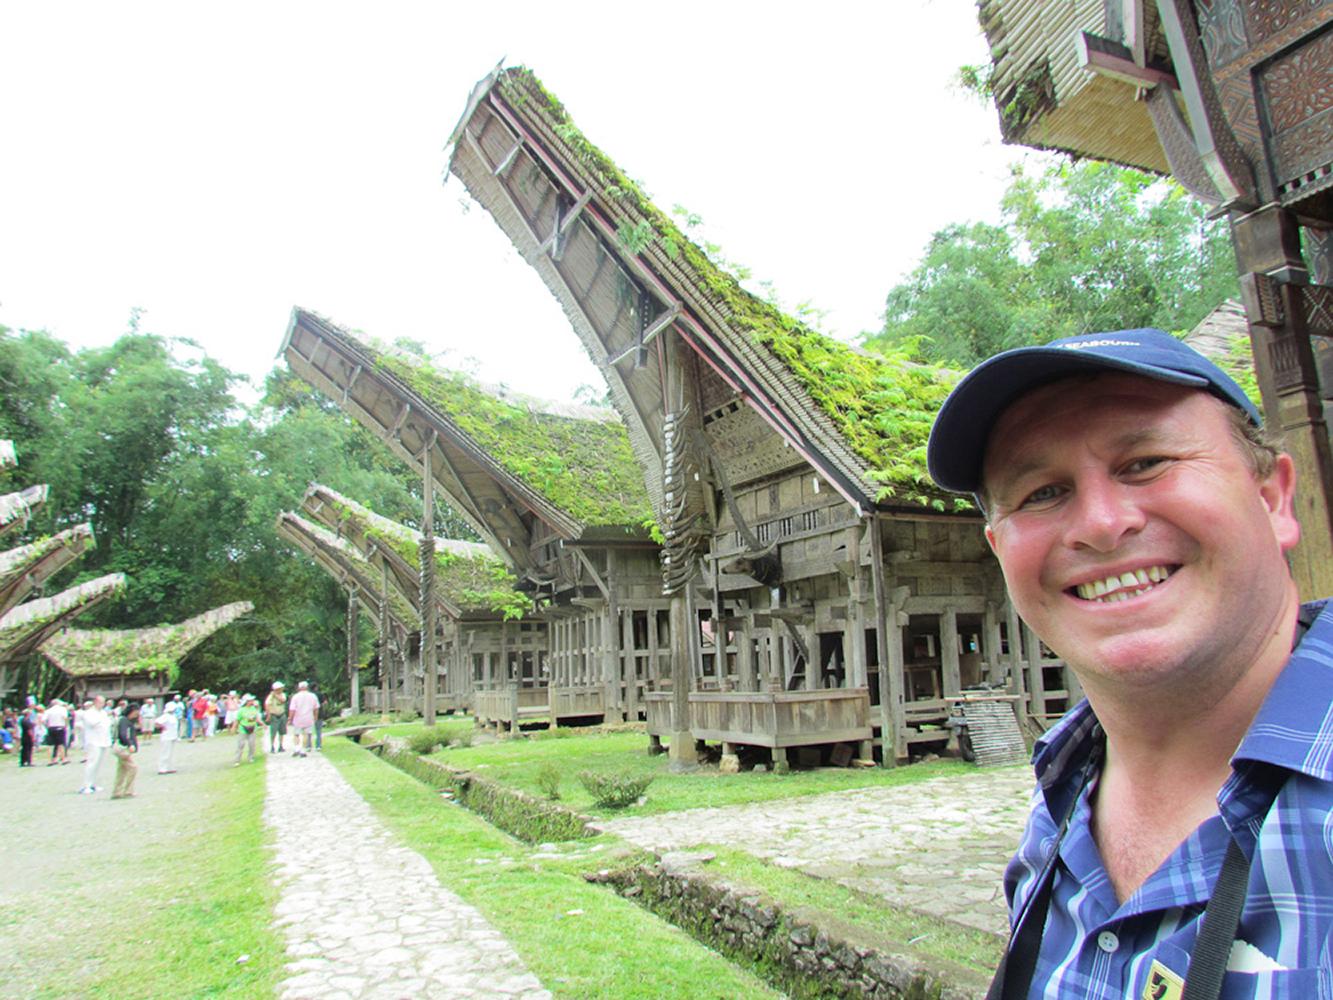 Tana Toraja, Sulawesi, Indonesia. The intriguing spirit boat houses